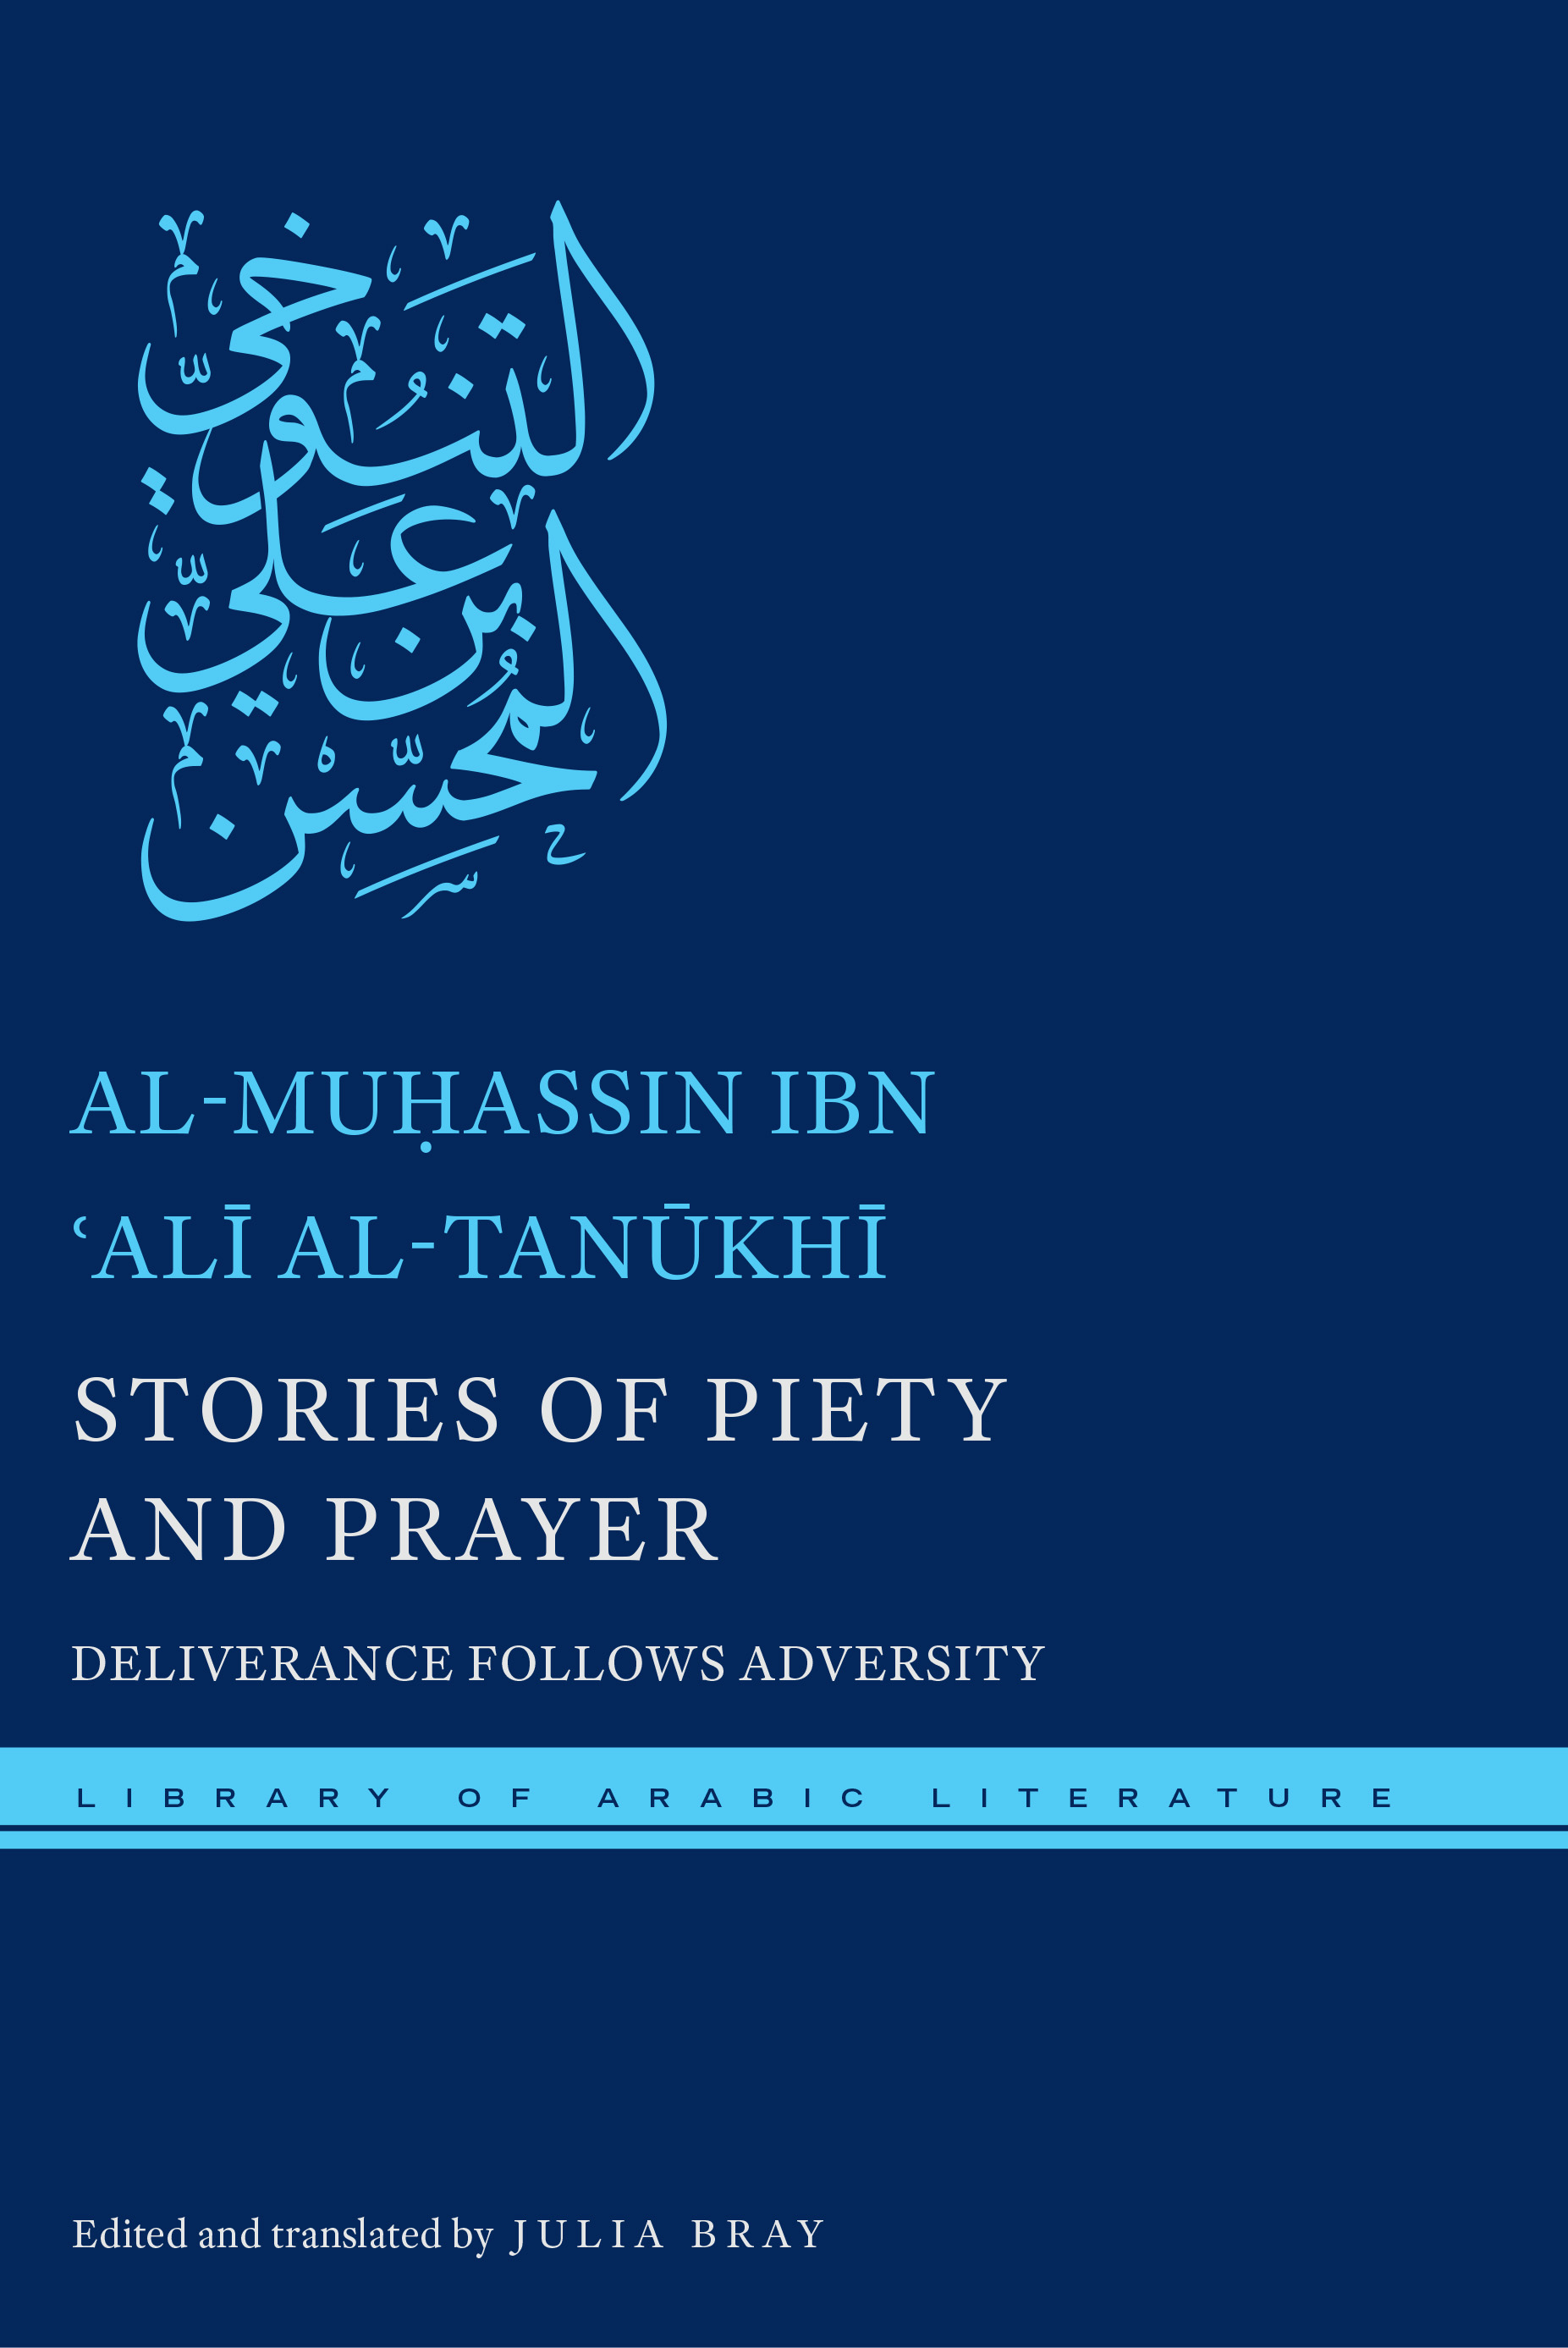 BLOG - Library of Arabic Literature   Library of Arabic Literature